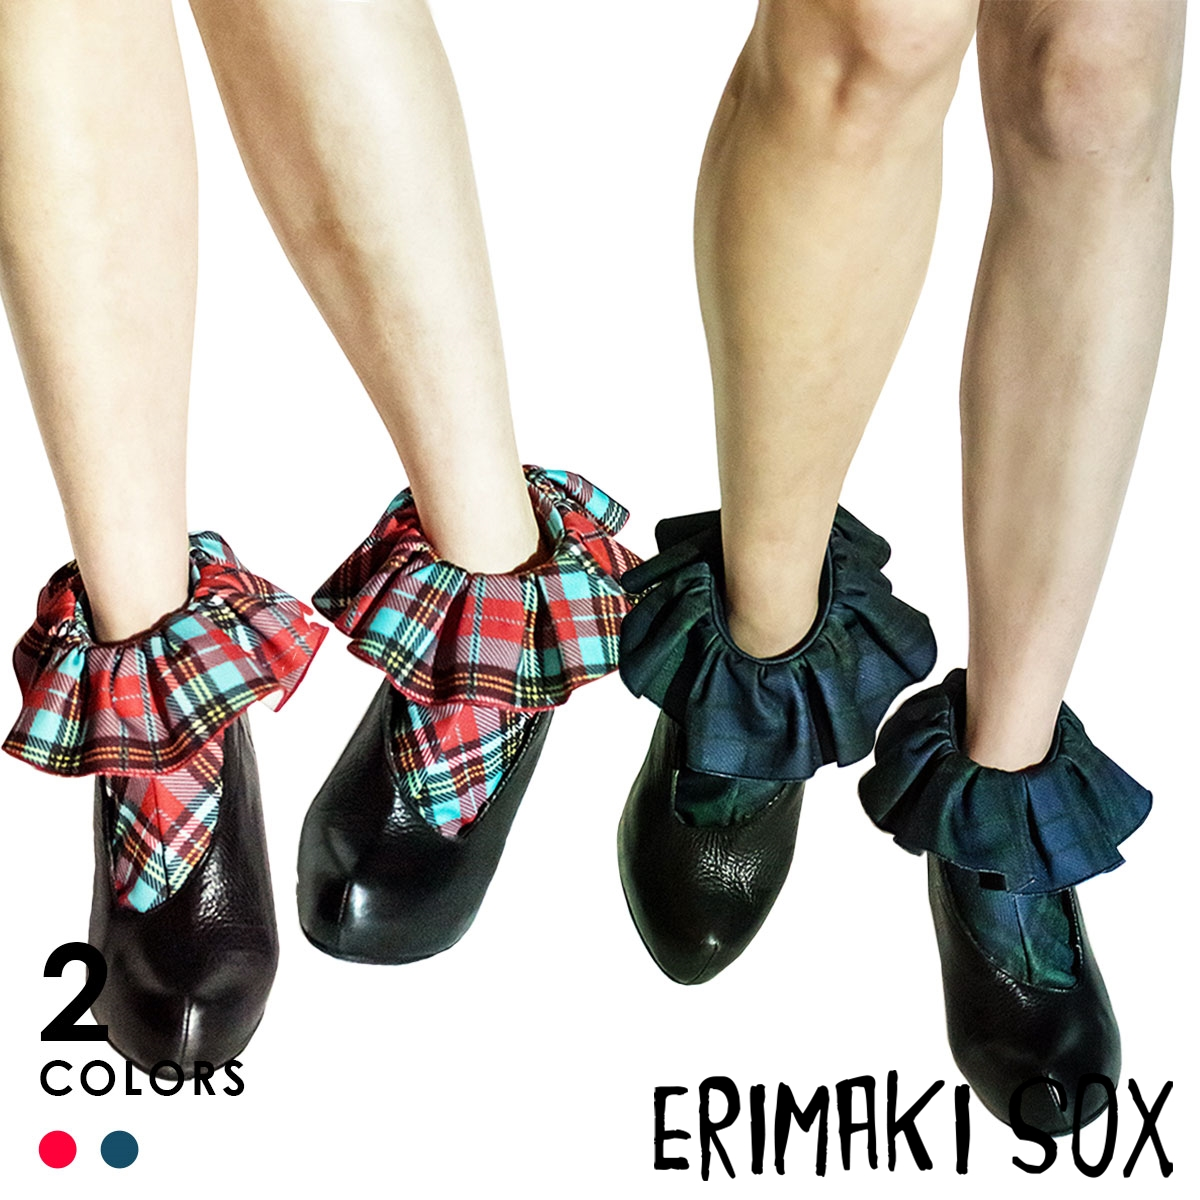 a4d9cc165e3 Beyond Cool  Elimaxoxerimakicolor check socks